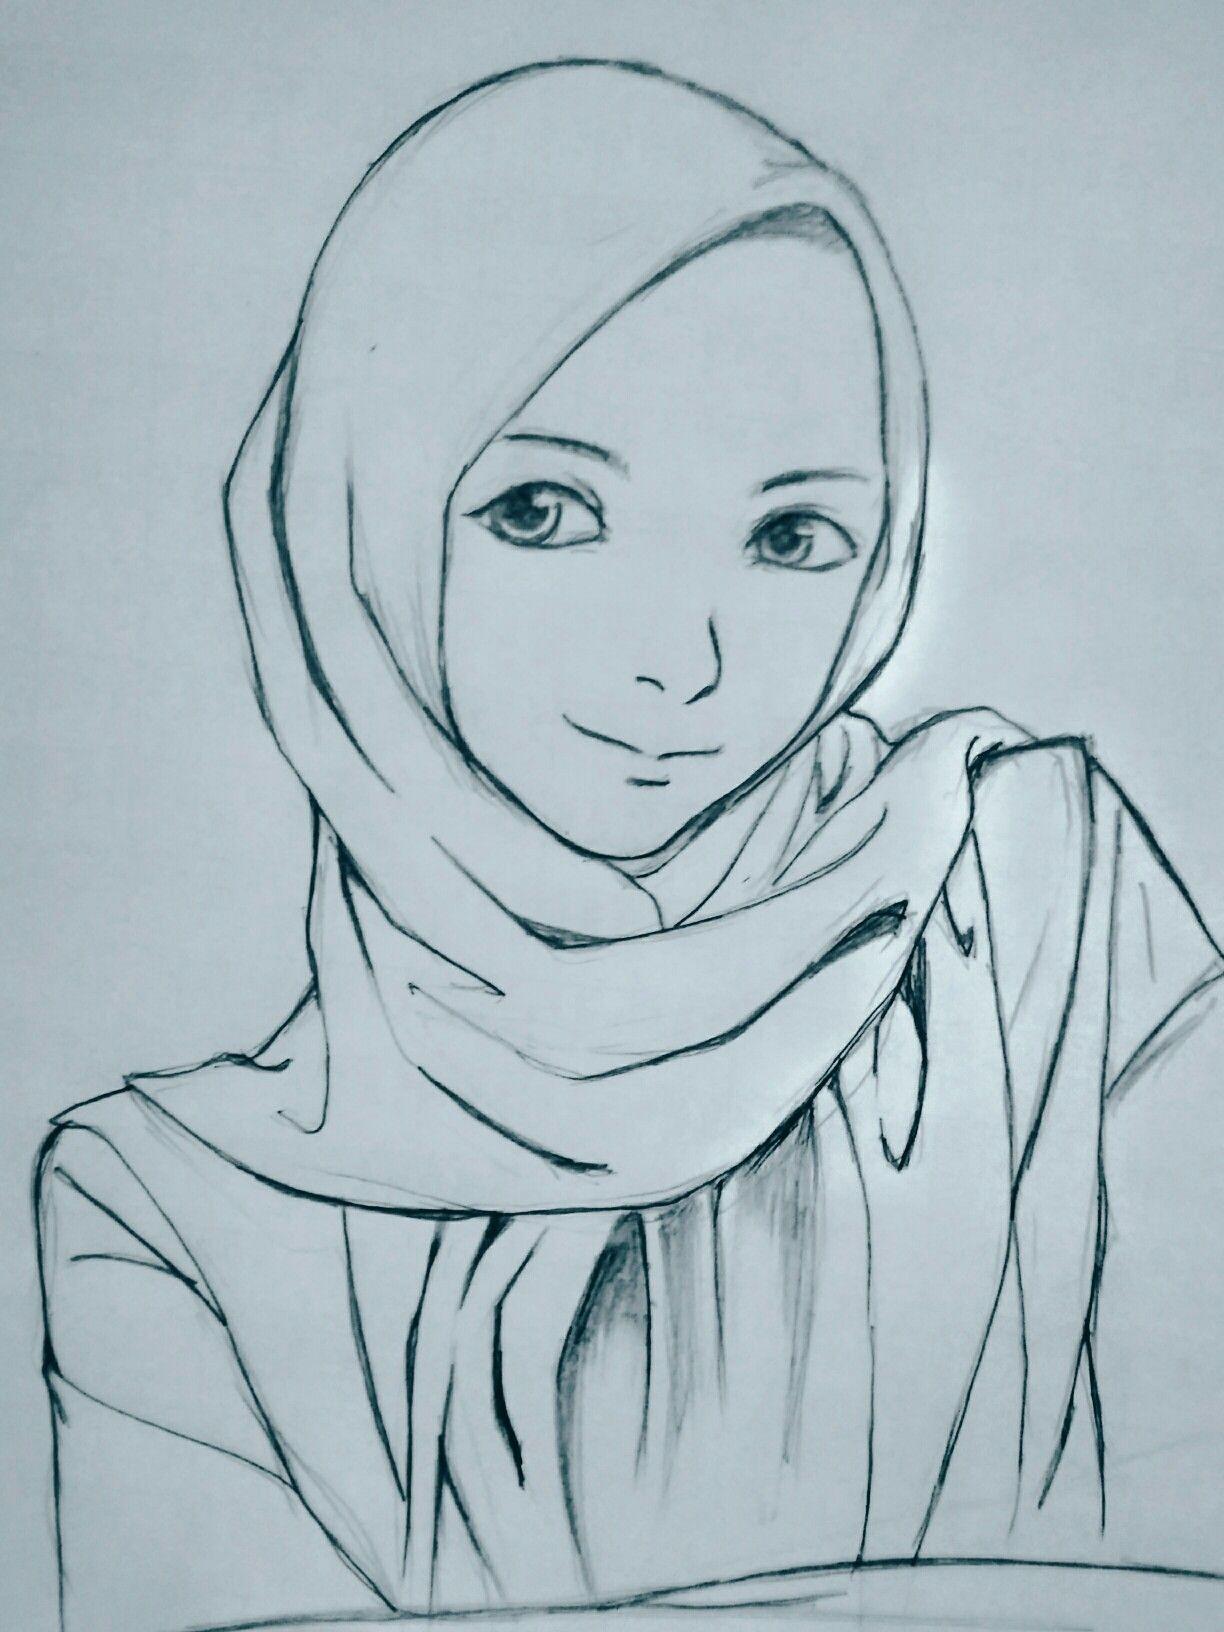 Pin Oleh Awach Di Drawings Sketsa Gambar Pensil Lukisan